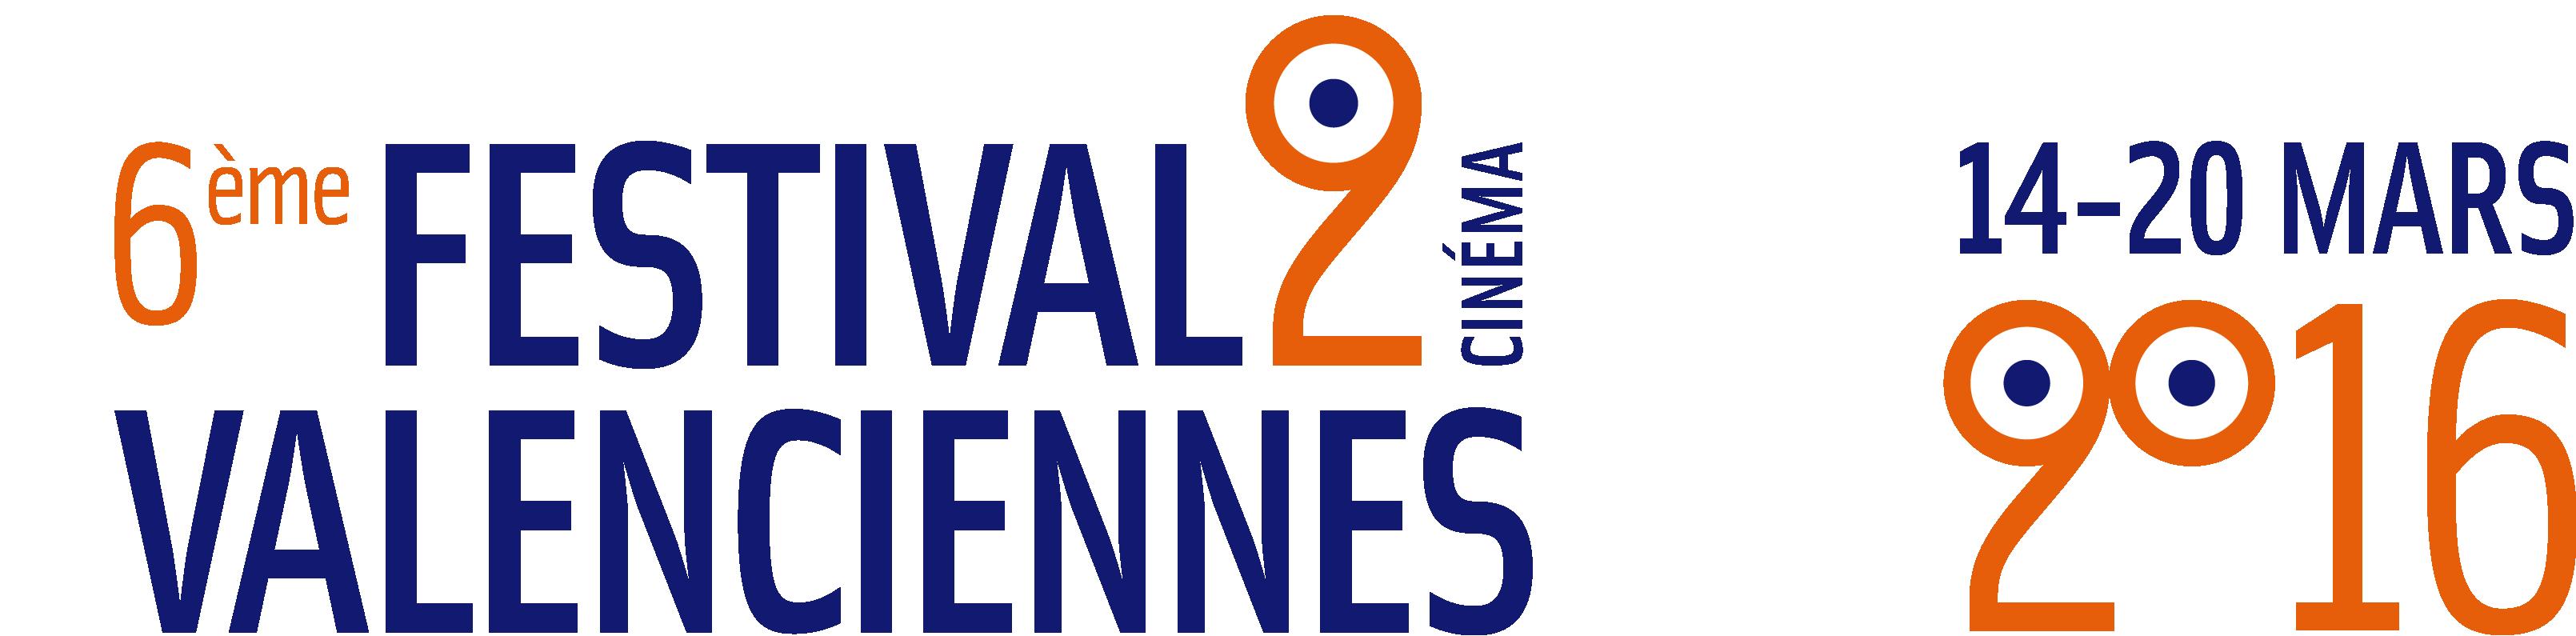 6ème festival de cinéma de Valenciennes, 14-20 mars 2016